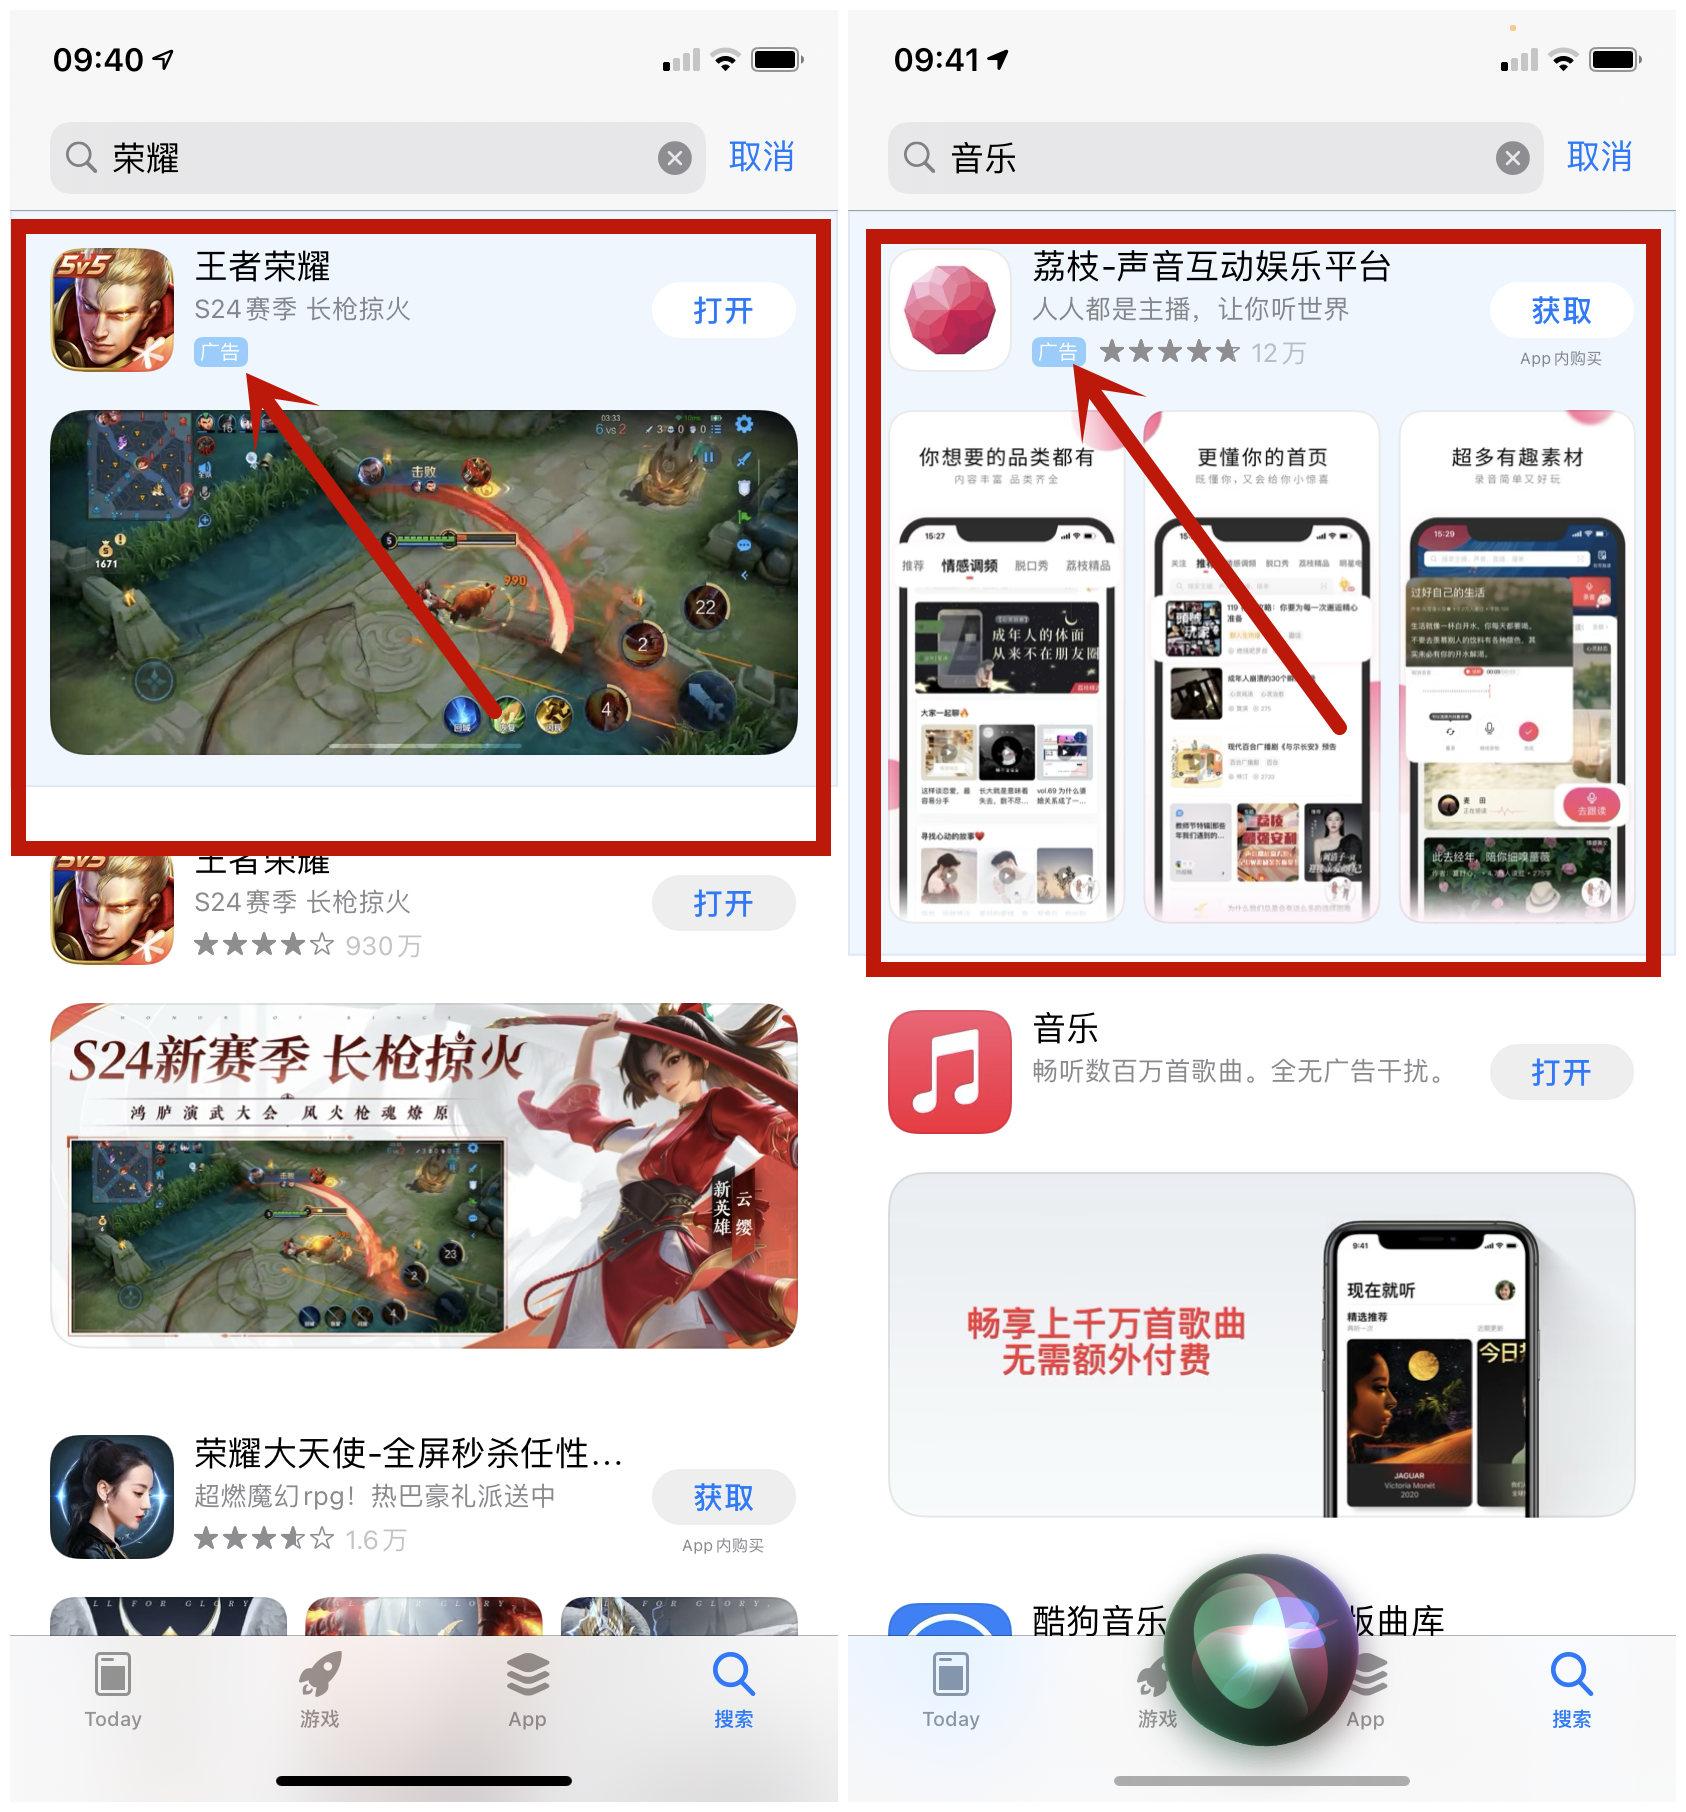 iPhone官方App植入广告:位置明显